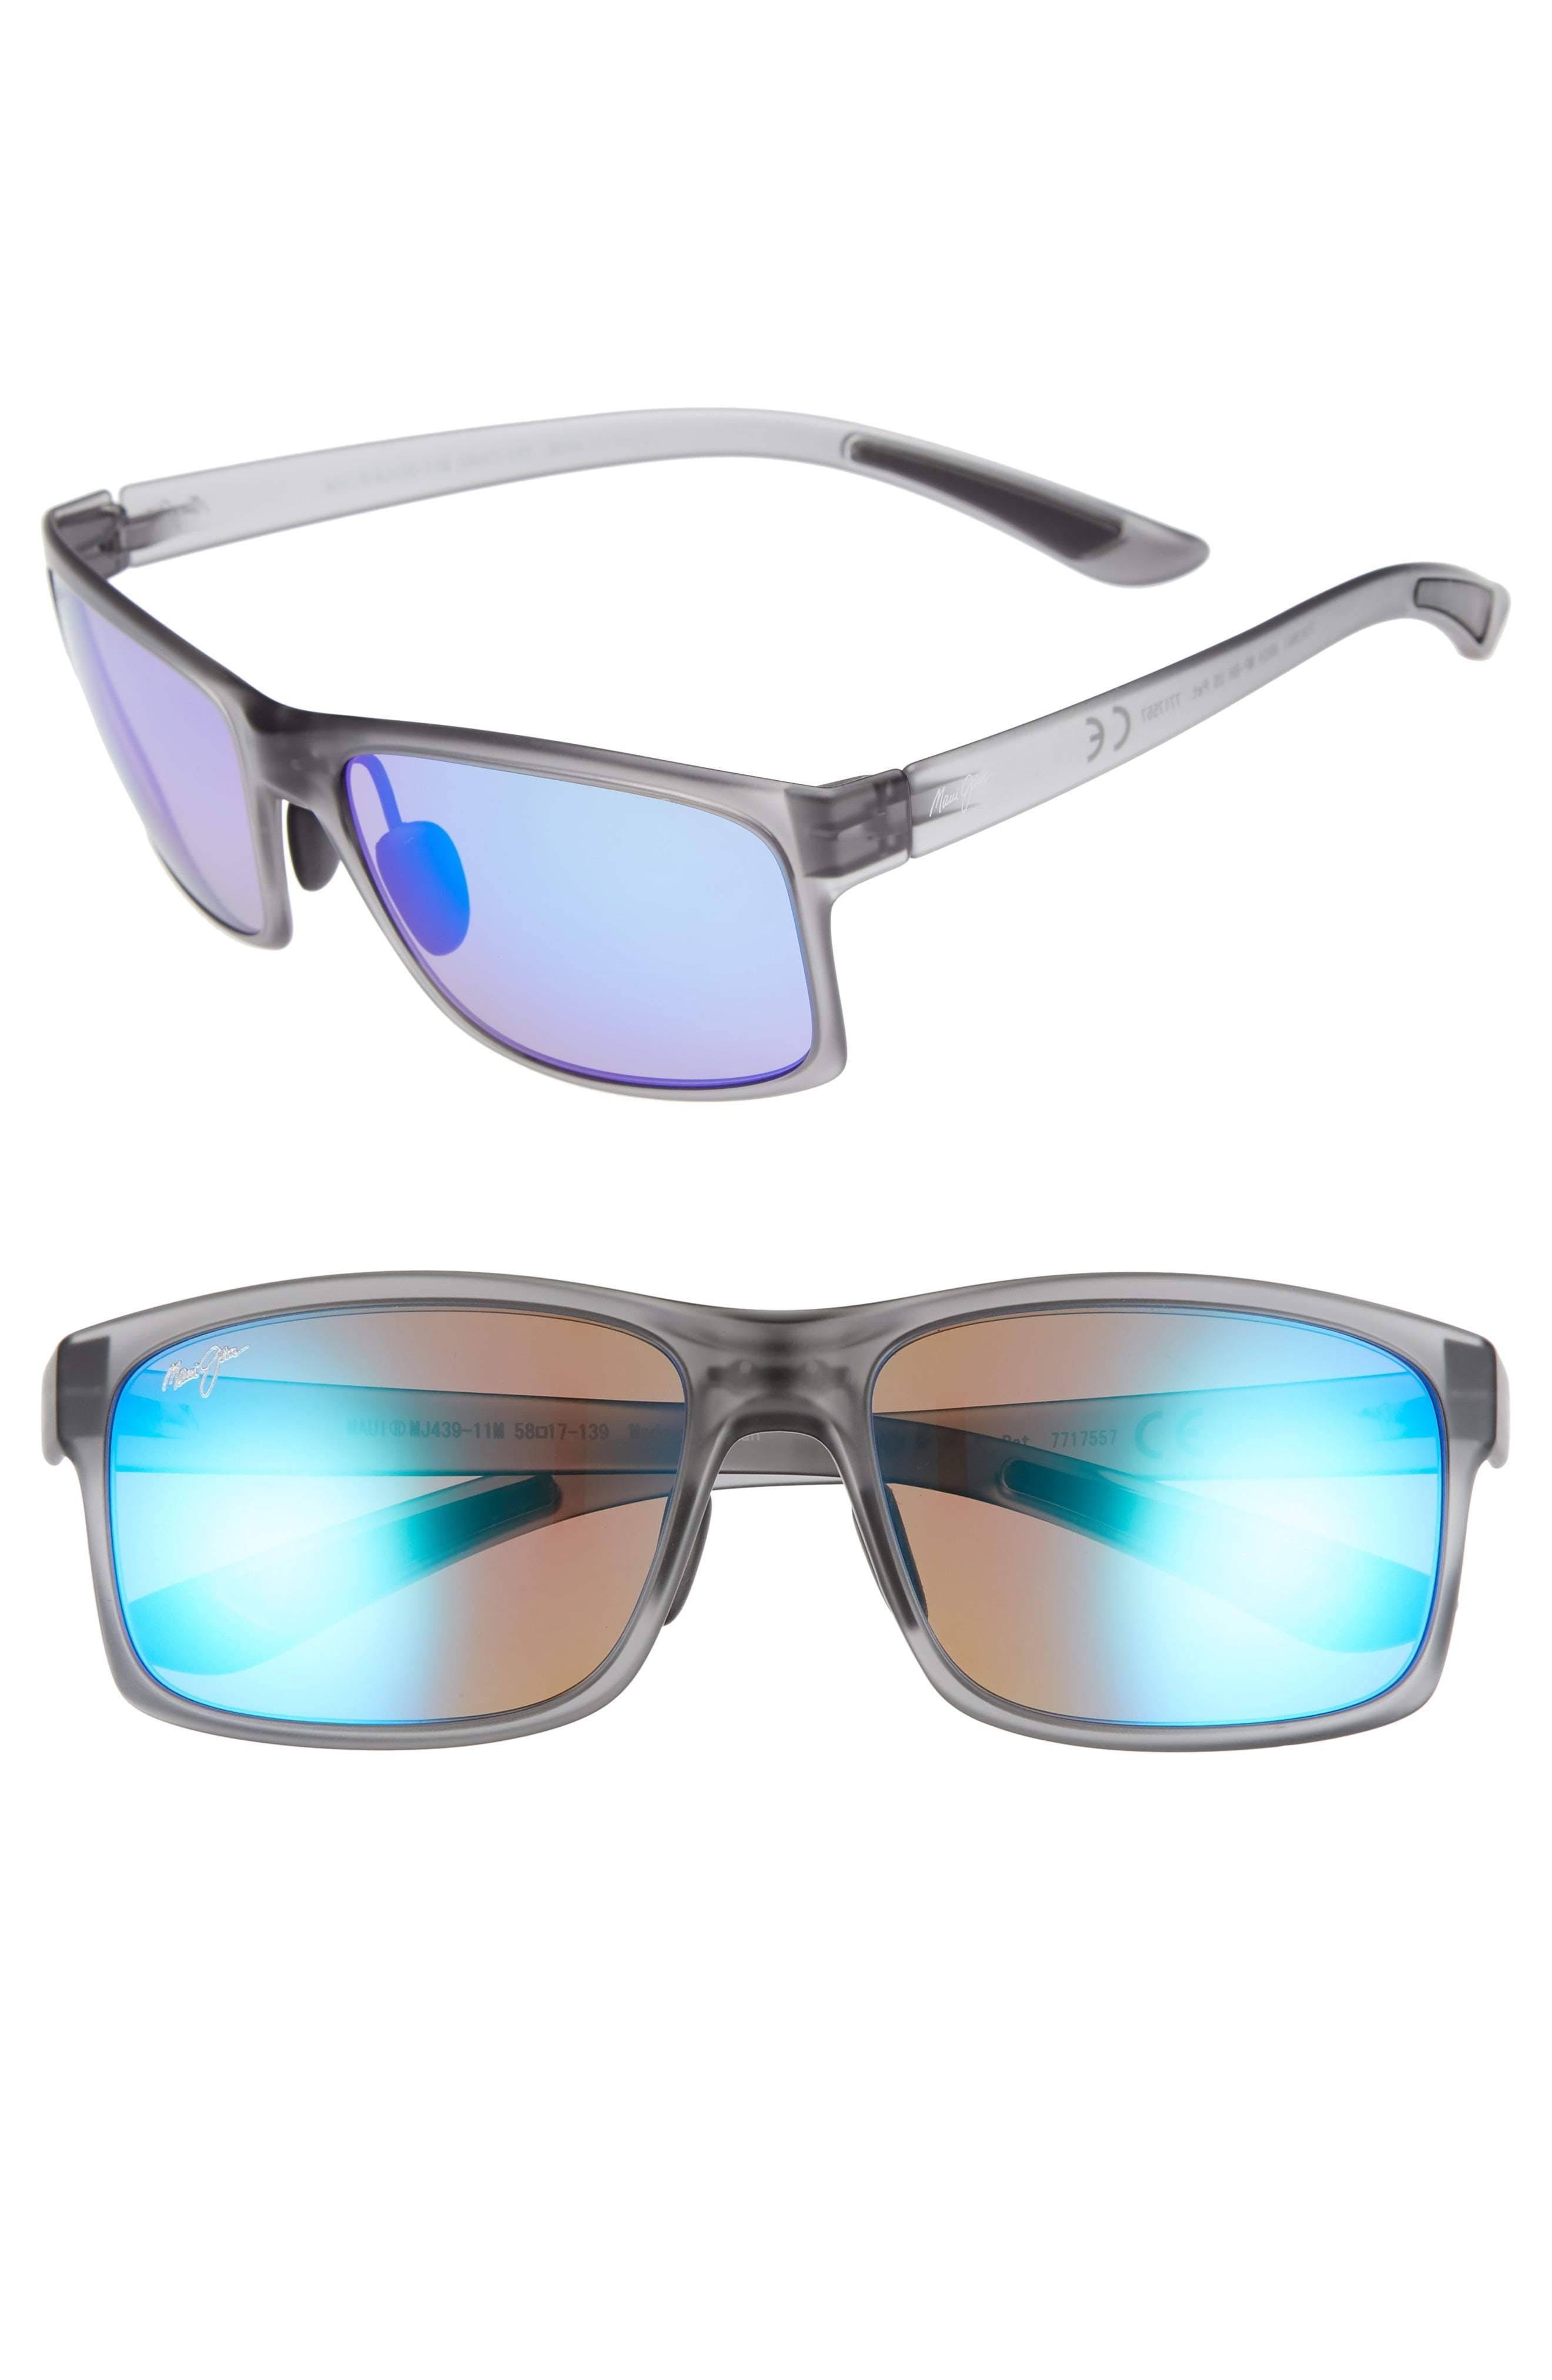 Maui Jim Pokowai Arch Sunglasses - B439-11M